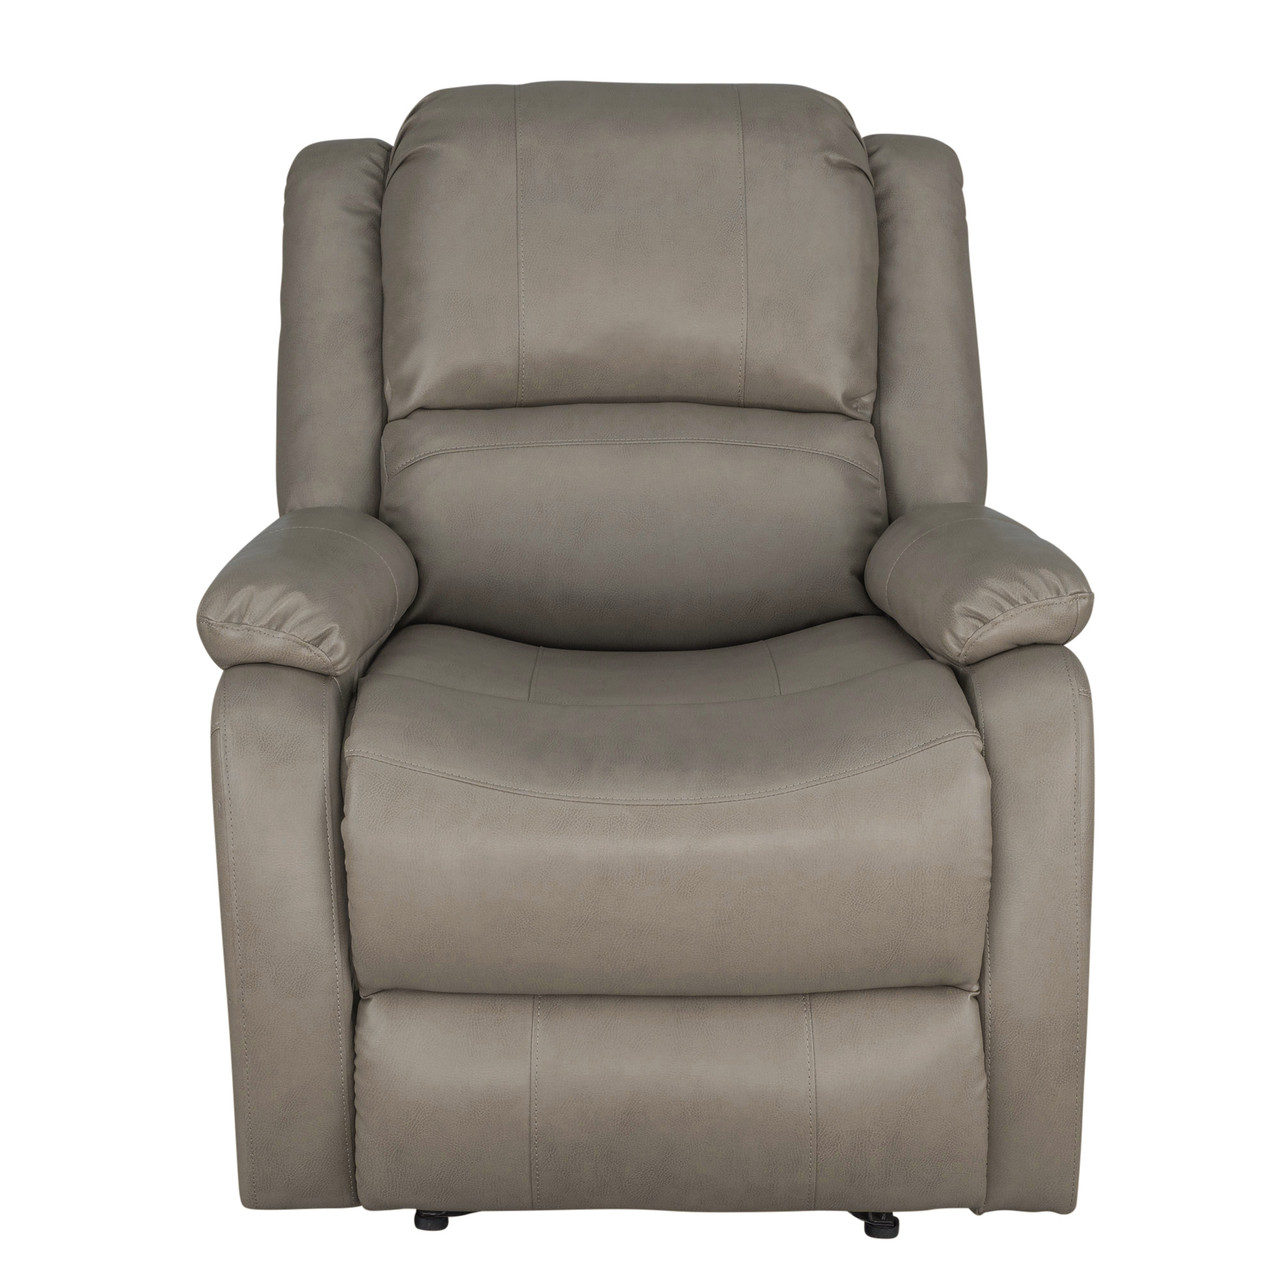 Excellent Recpro Charles 30 Rv Wall Hugger Recliner Rv Zero Wall Uwap Interior Chair Design Uwaporg